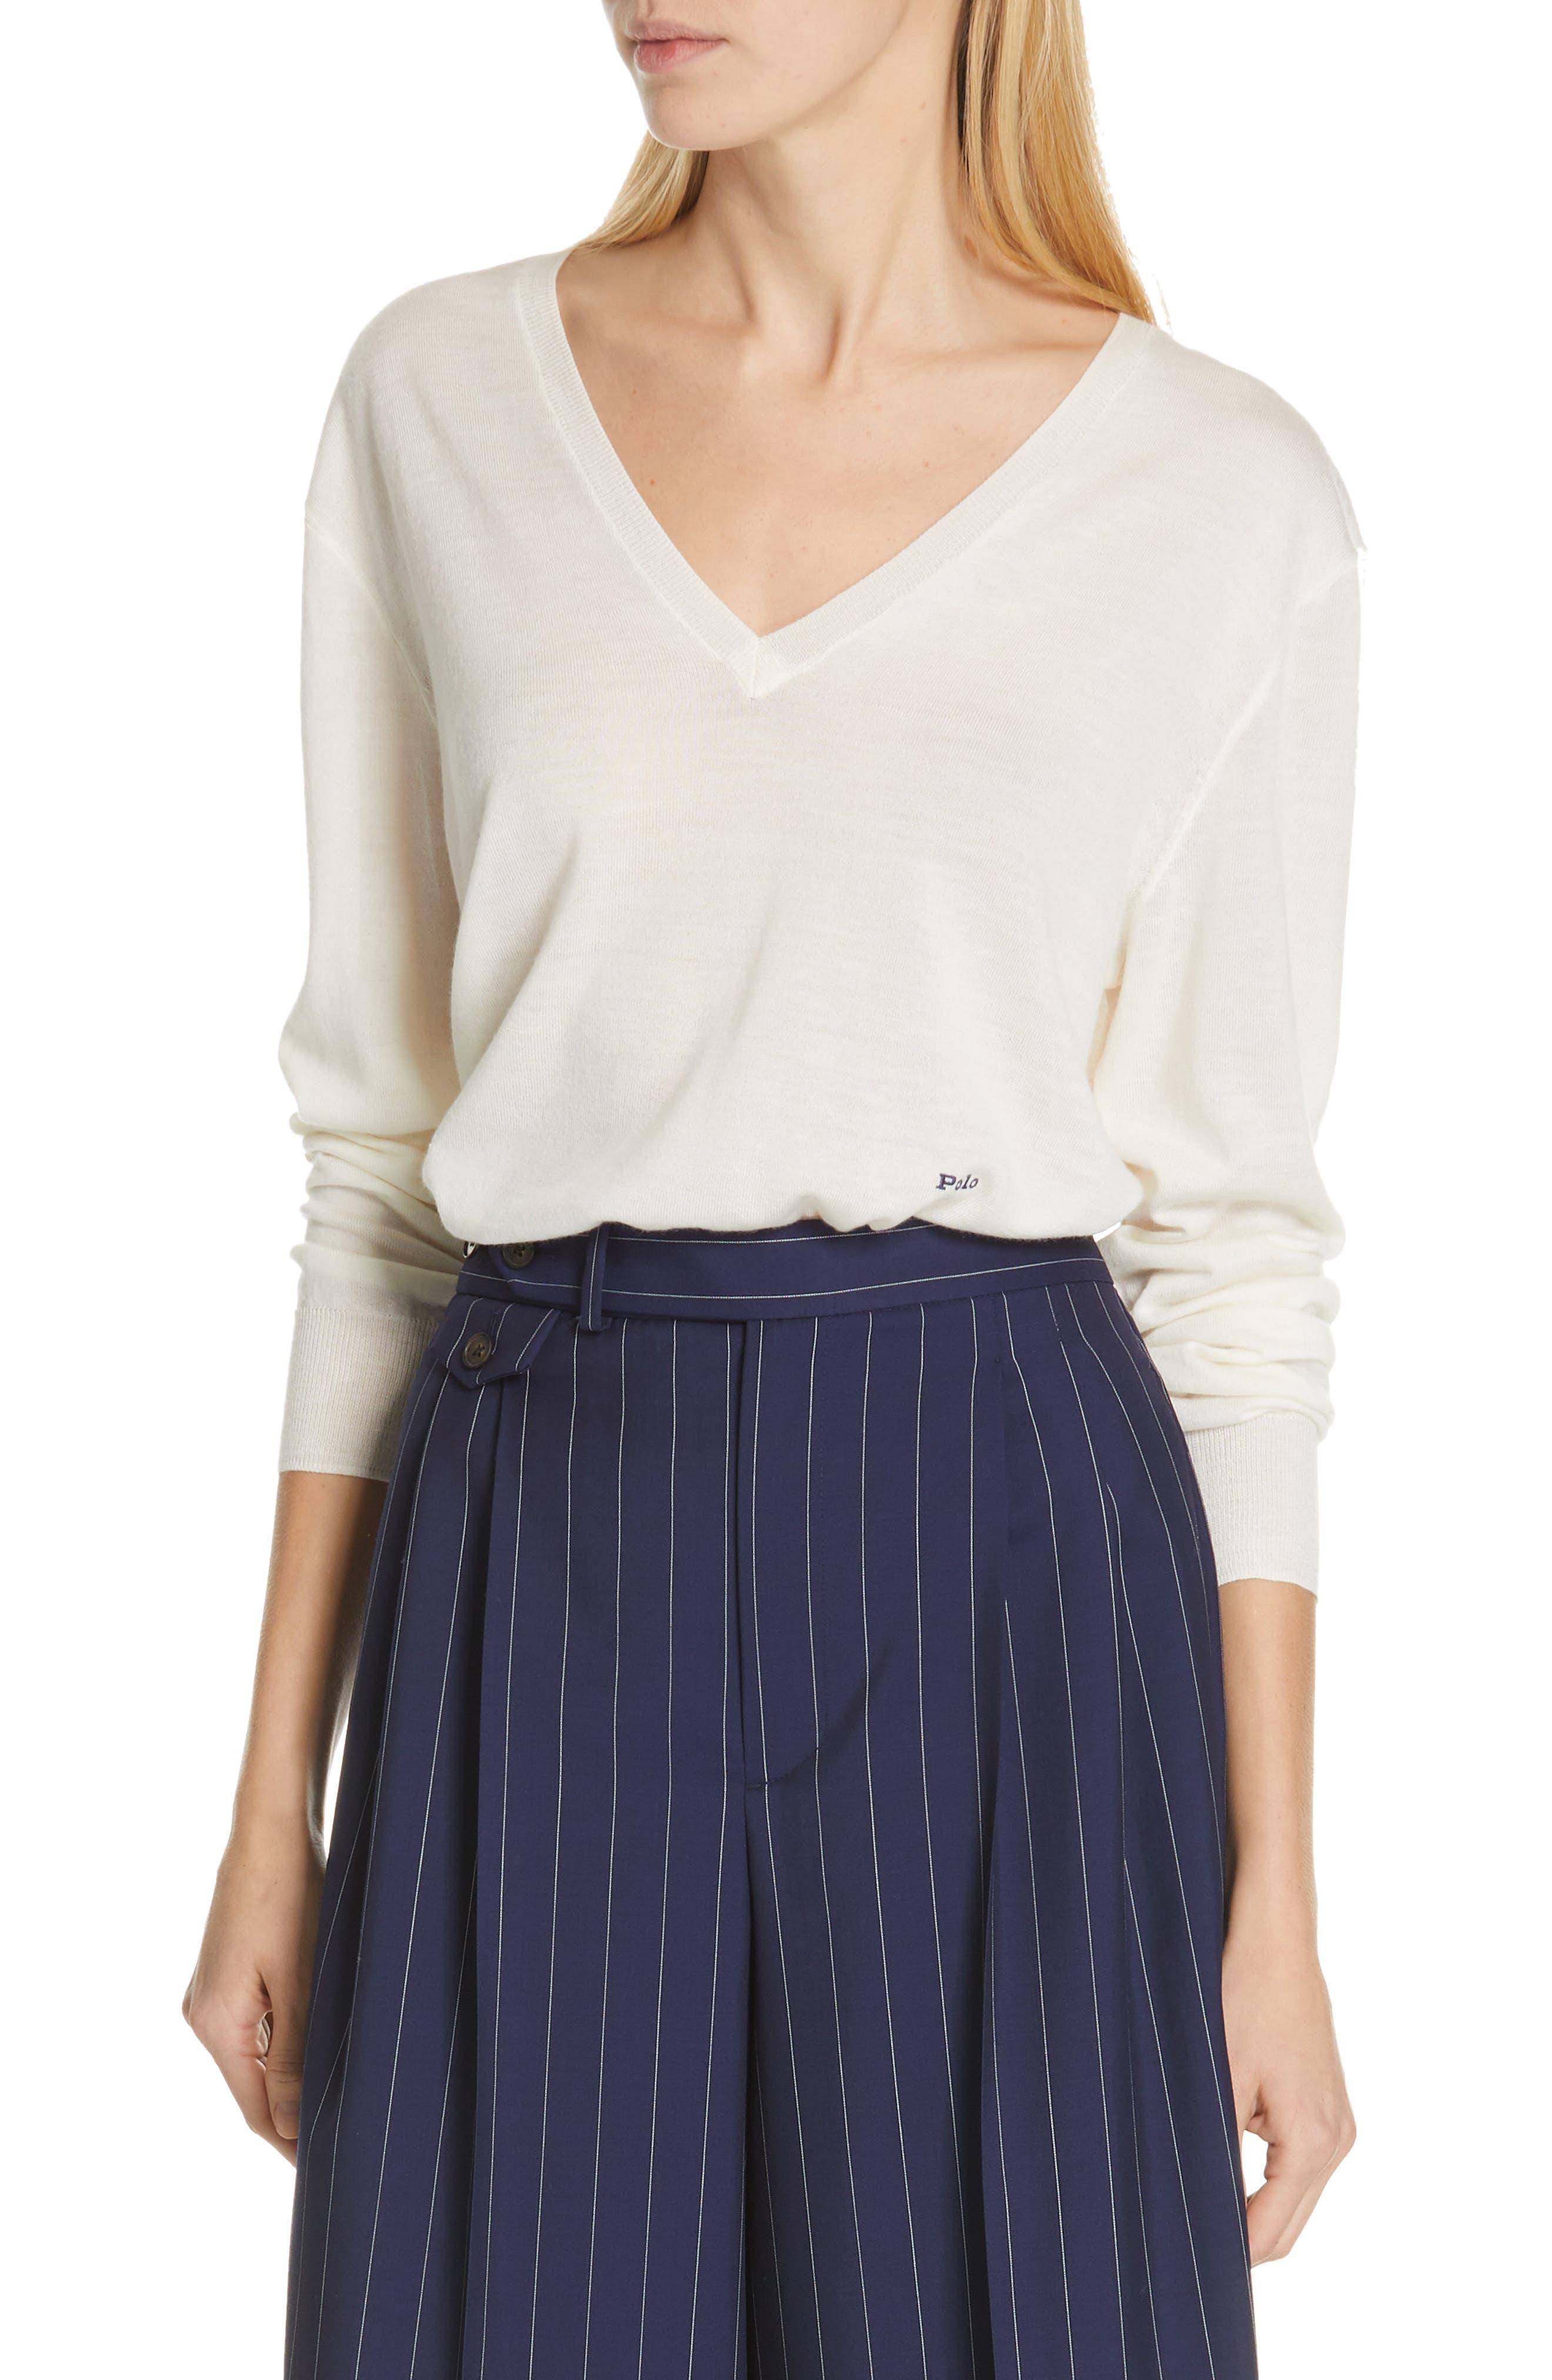 Polo Ralph Lauren V-Neck Wool, Silk & Cashmere Sweater, Ivory